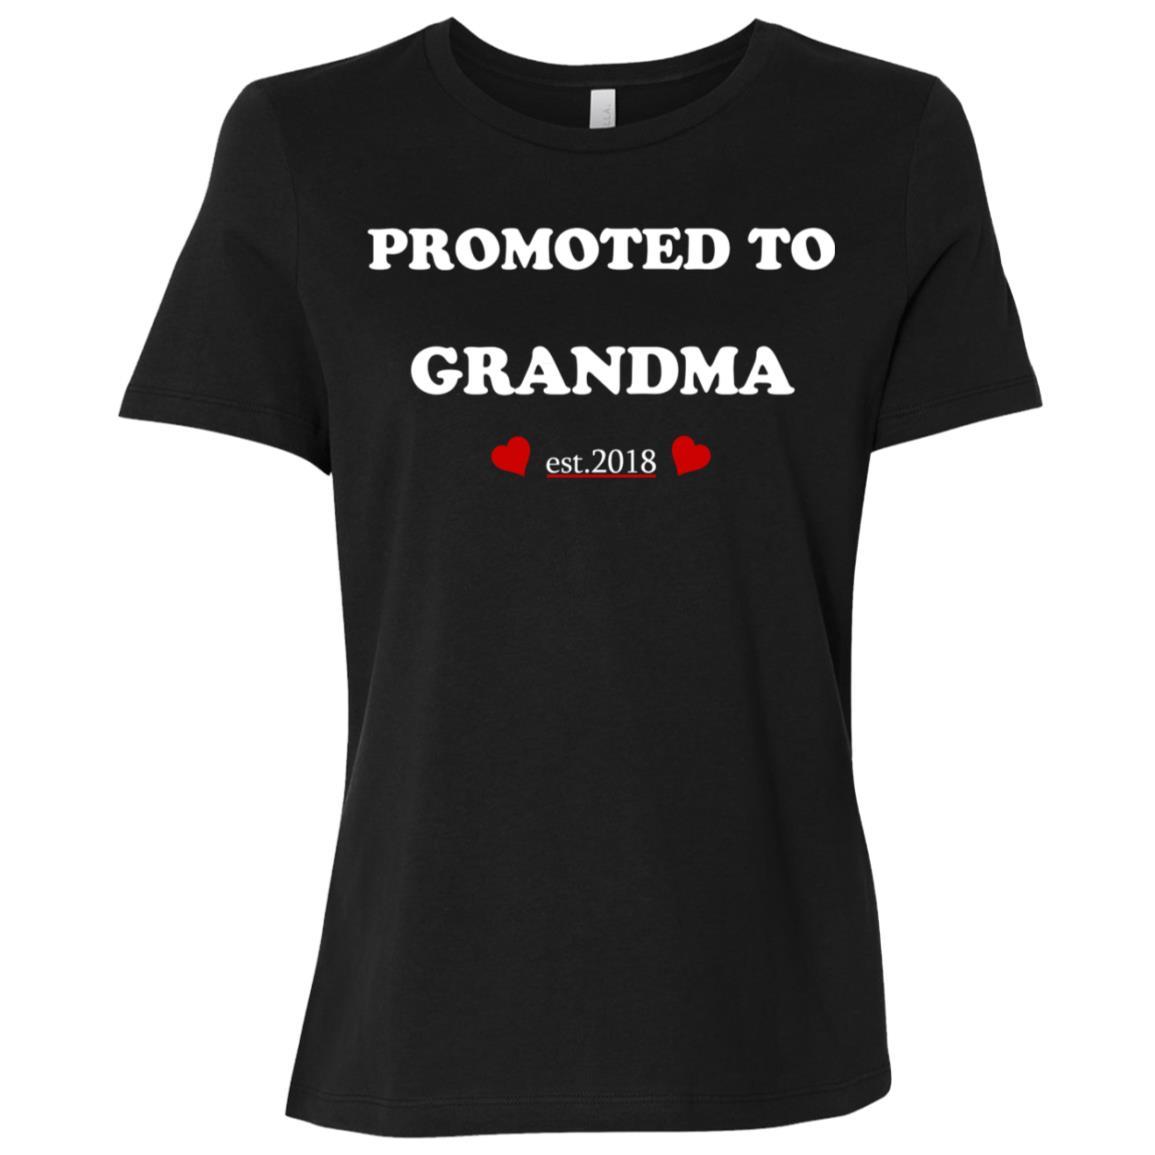 Promoted to grandma 2019 Women Short Sleeve T-Shirt